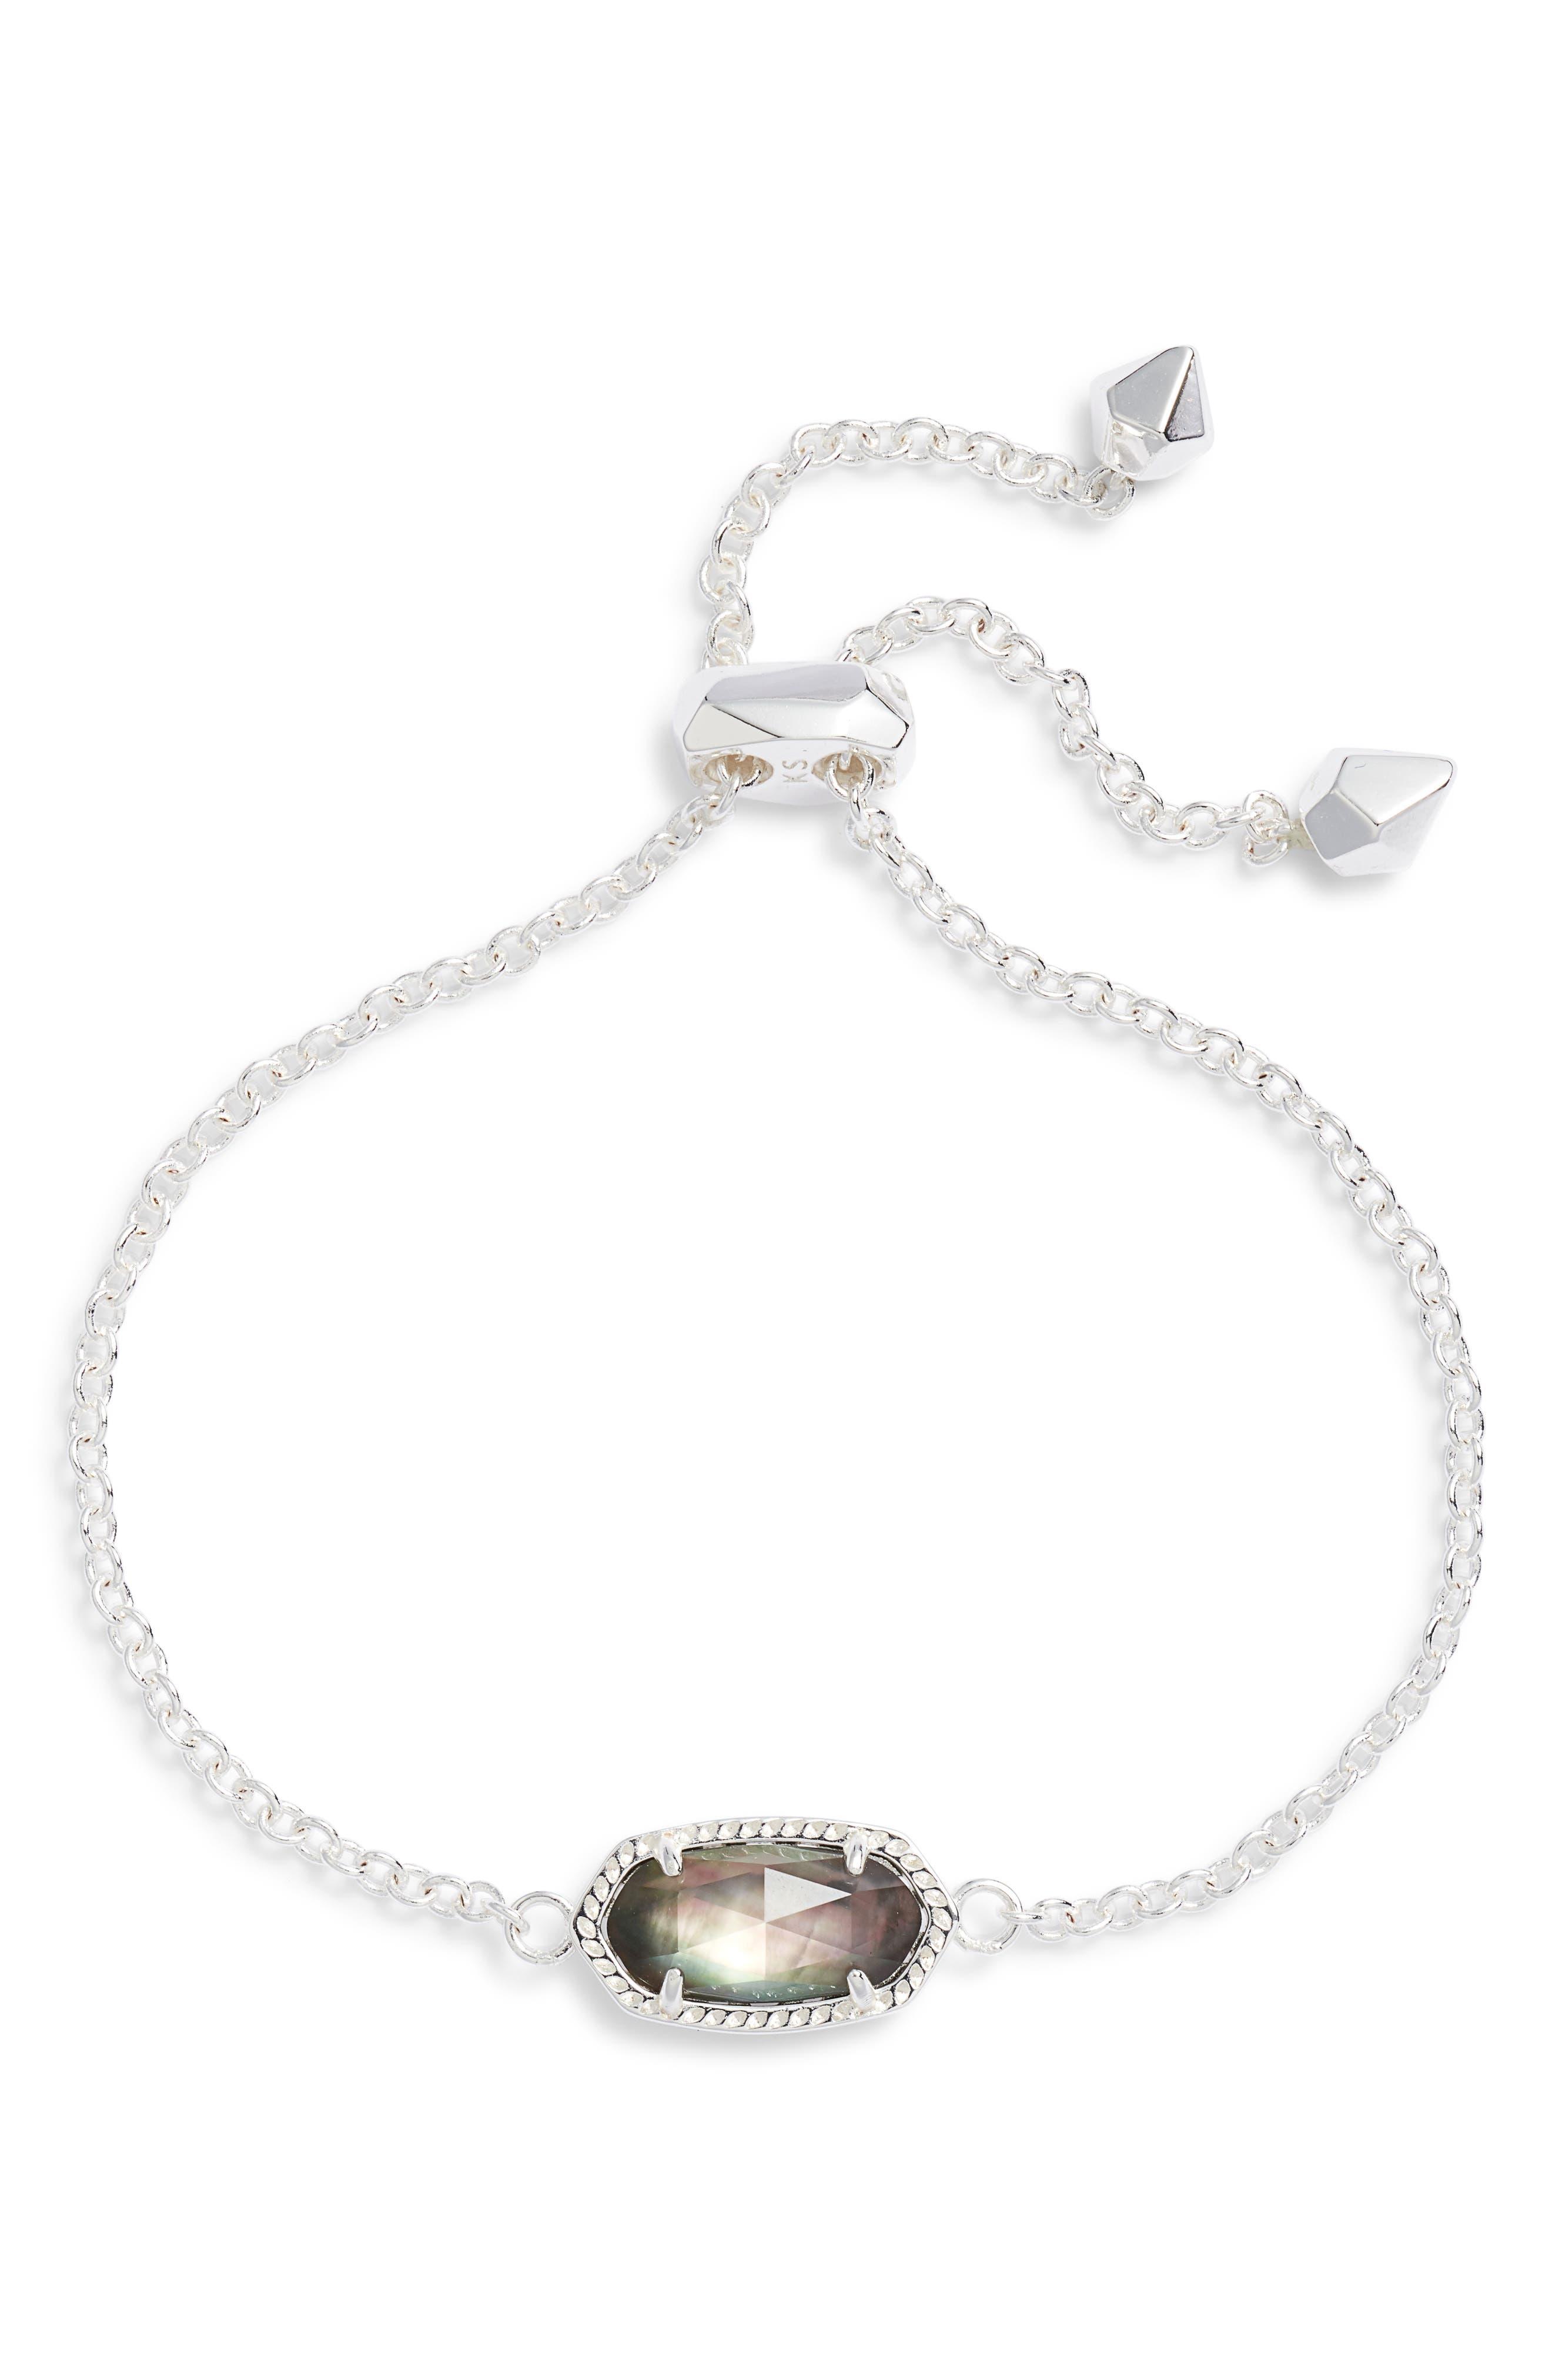 KENDRA SCOTT Elaina Bracelet, Main, color, BRIGHT SILVER/ BLACK MOP